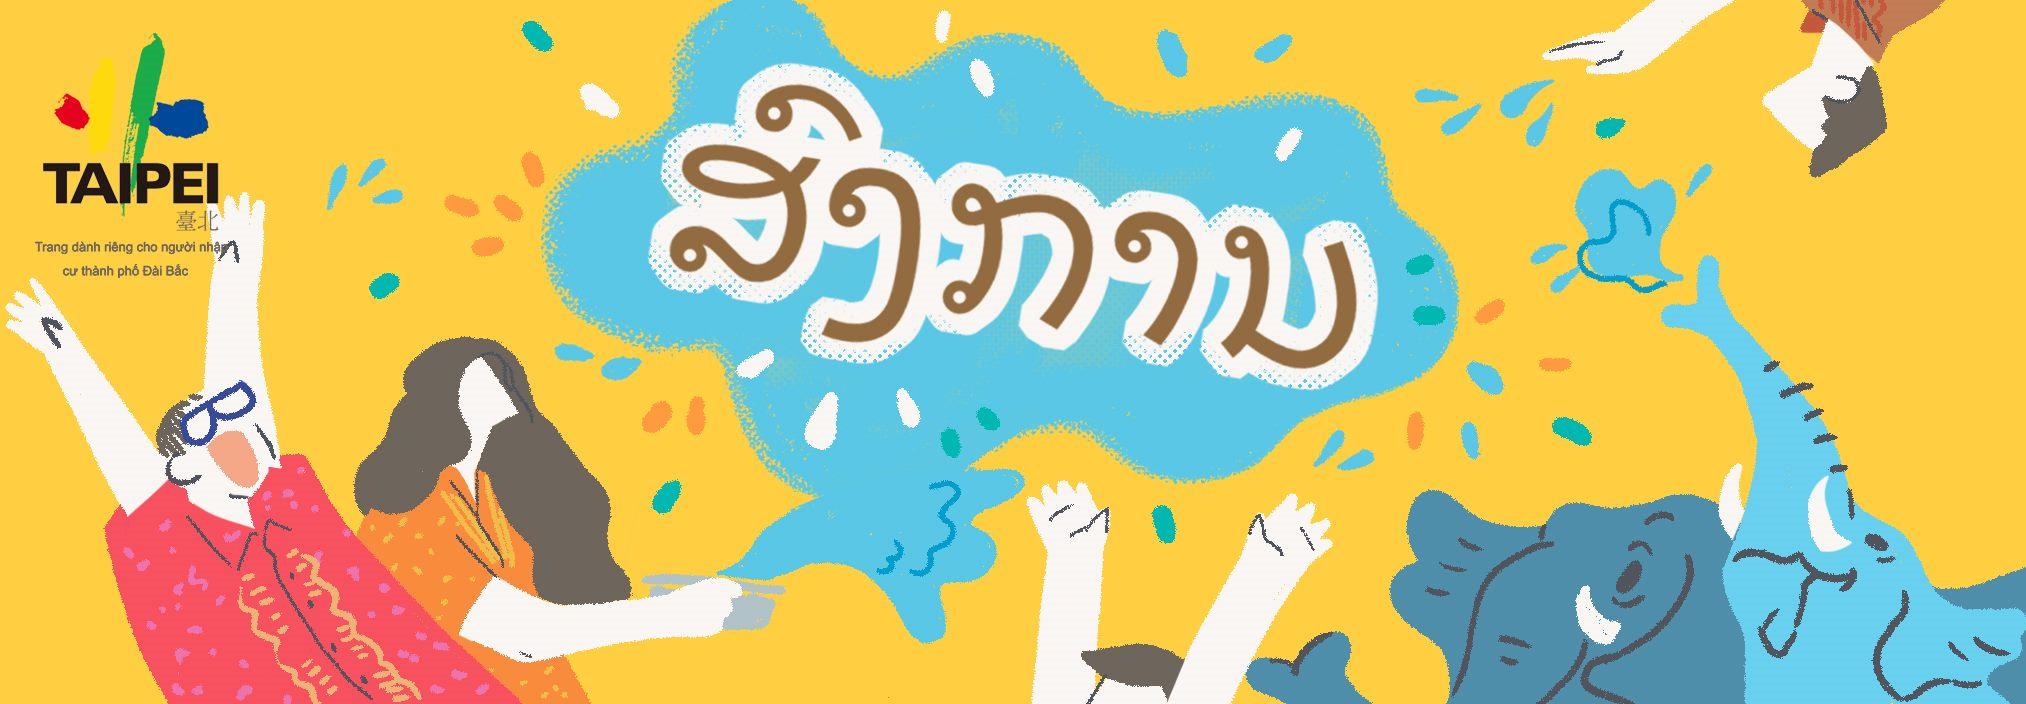 2020-泰國潑水節banner